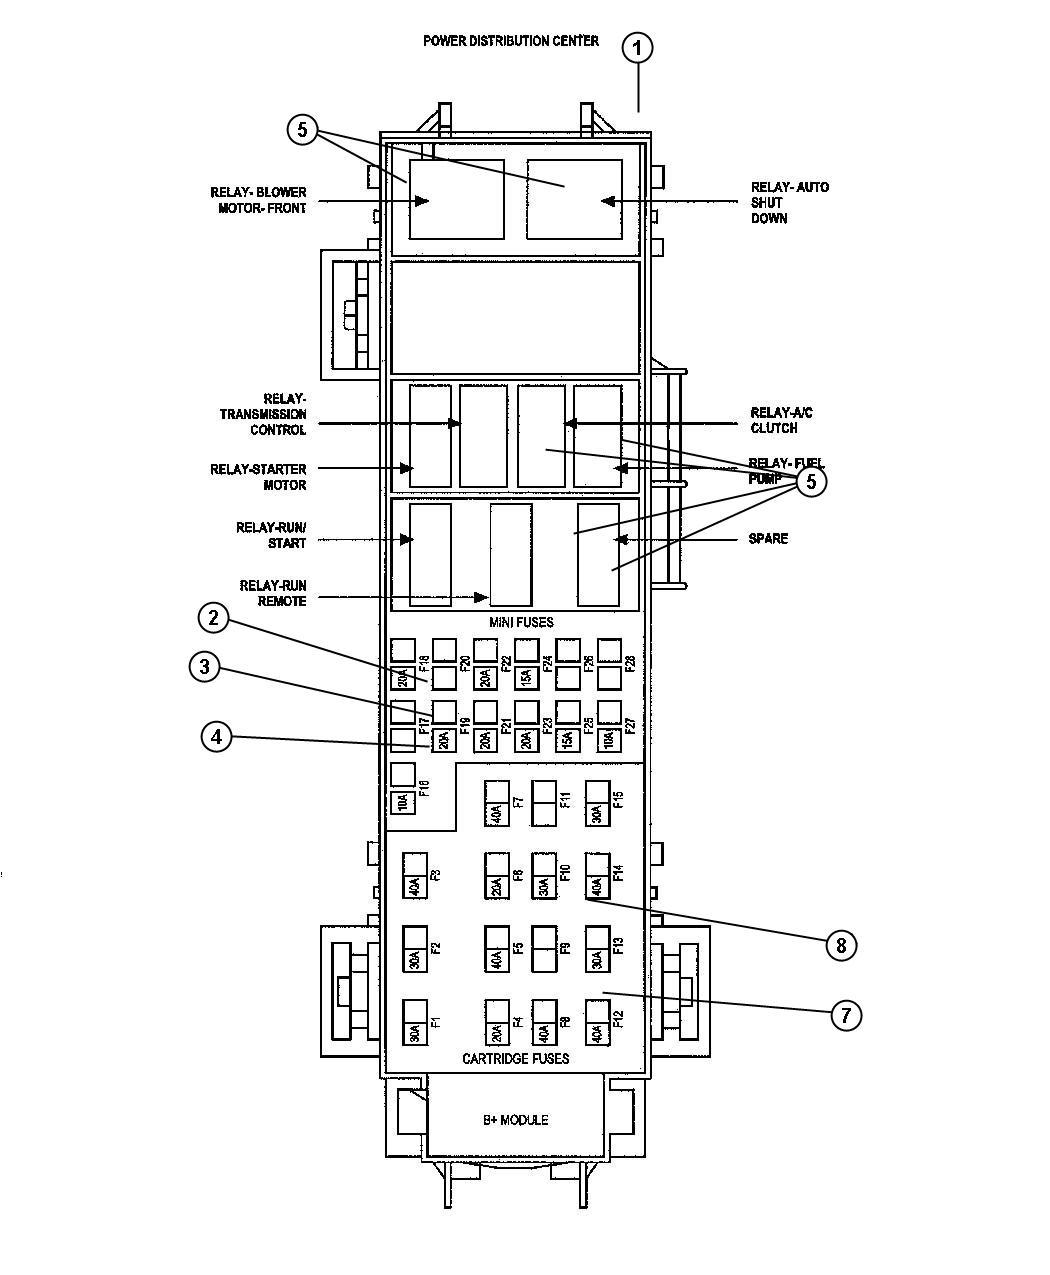 Dodge Durango Cover Power Distribution Center Ipm Module